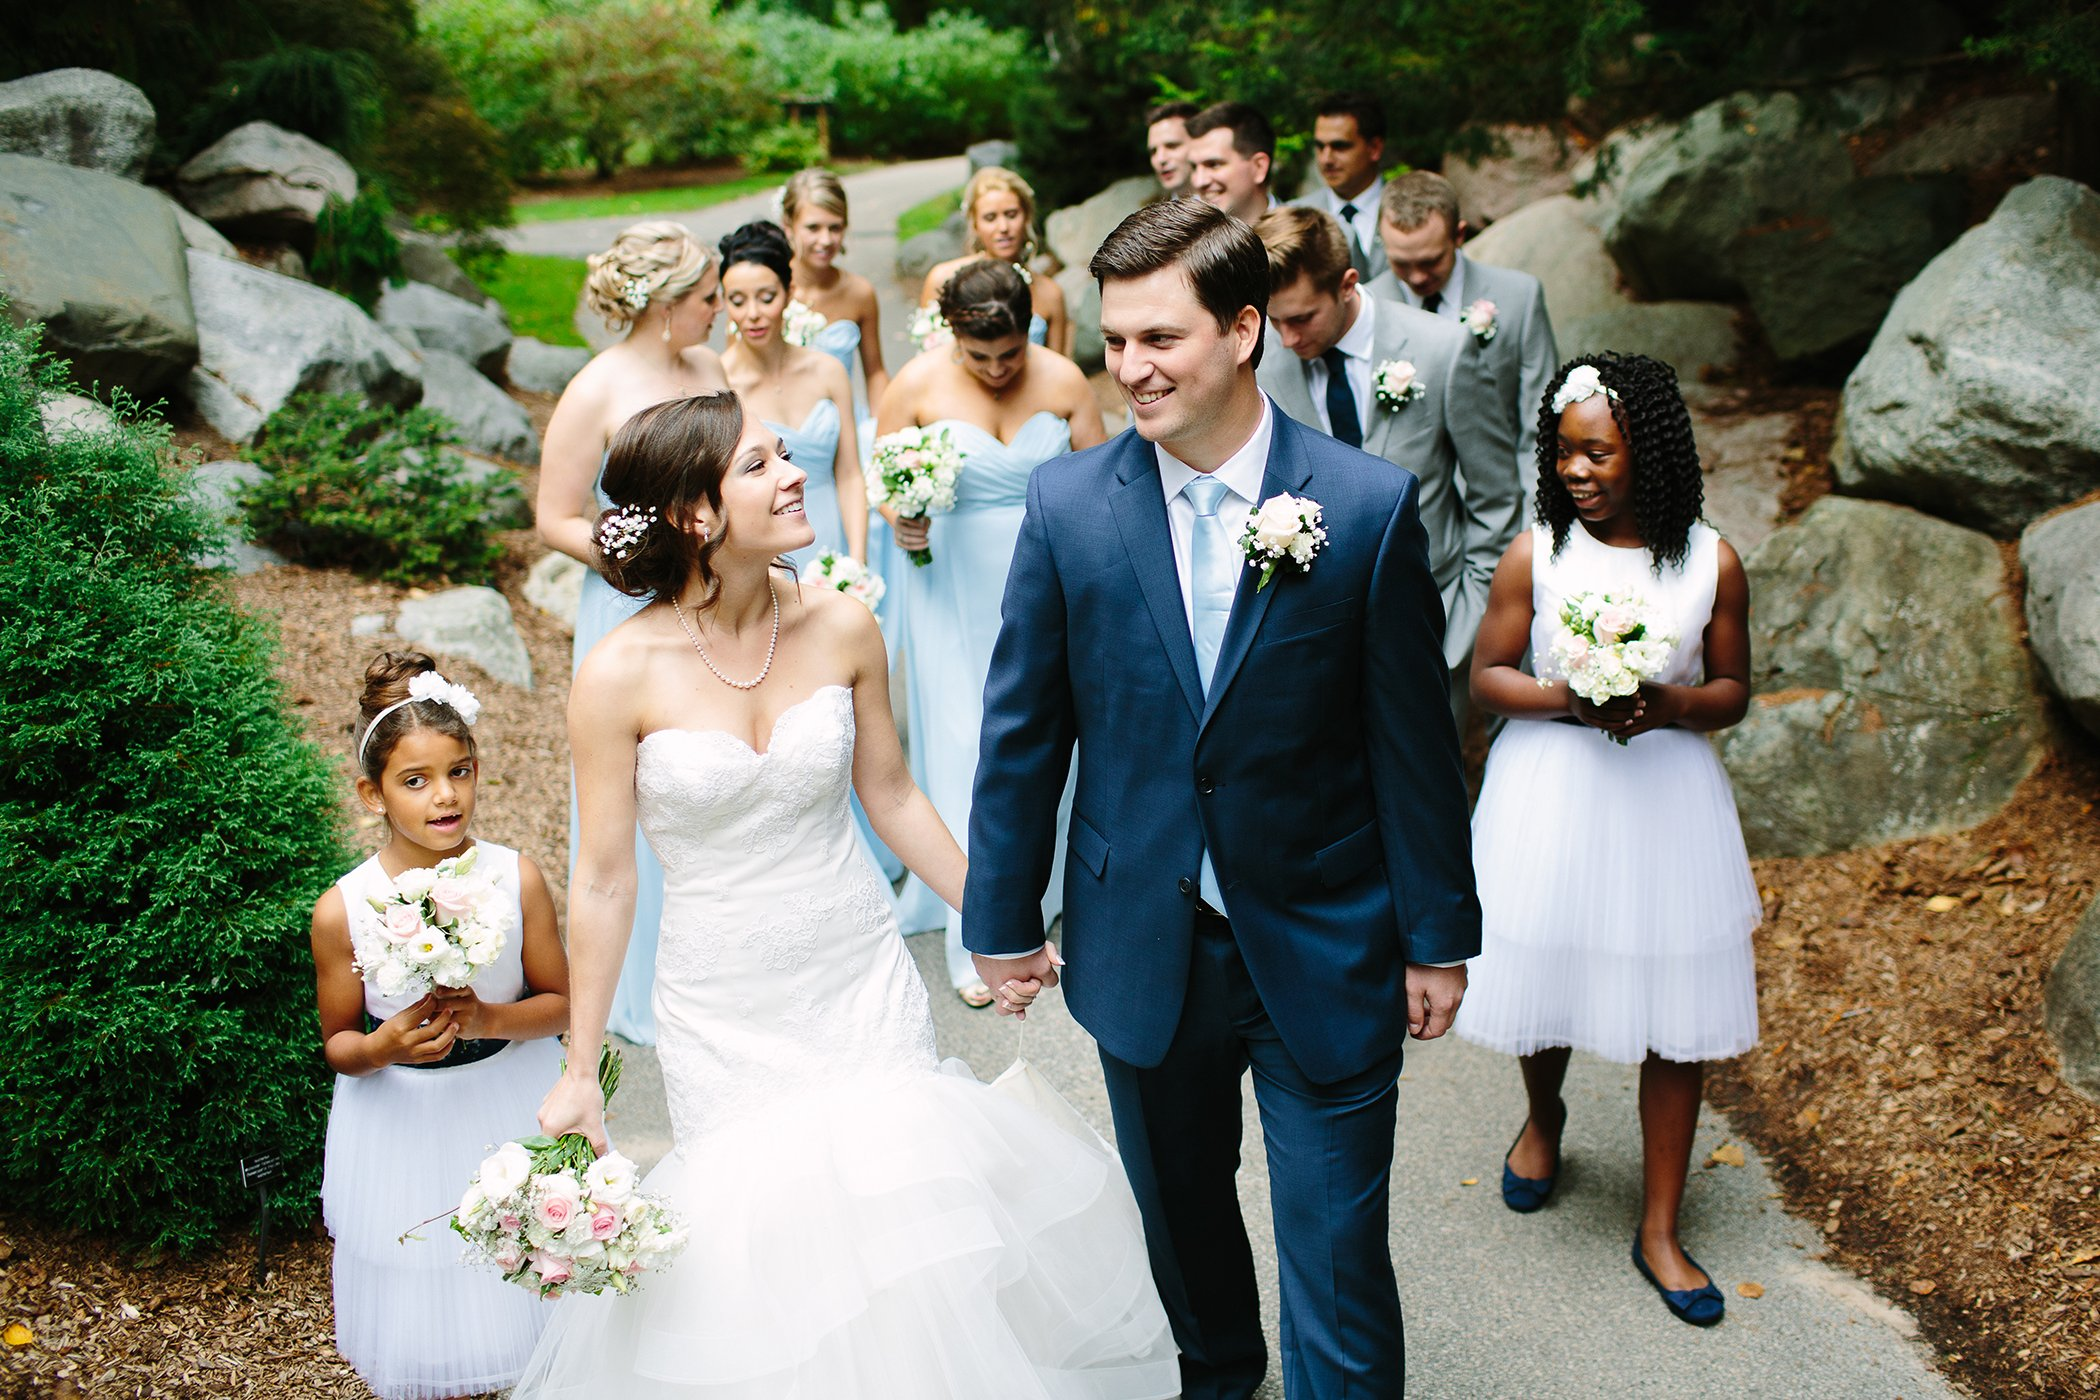 Midland, MI Wedding Photography - Bethany & Brad - © Dan Stewart Photography